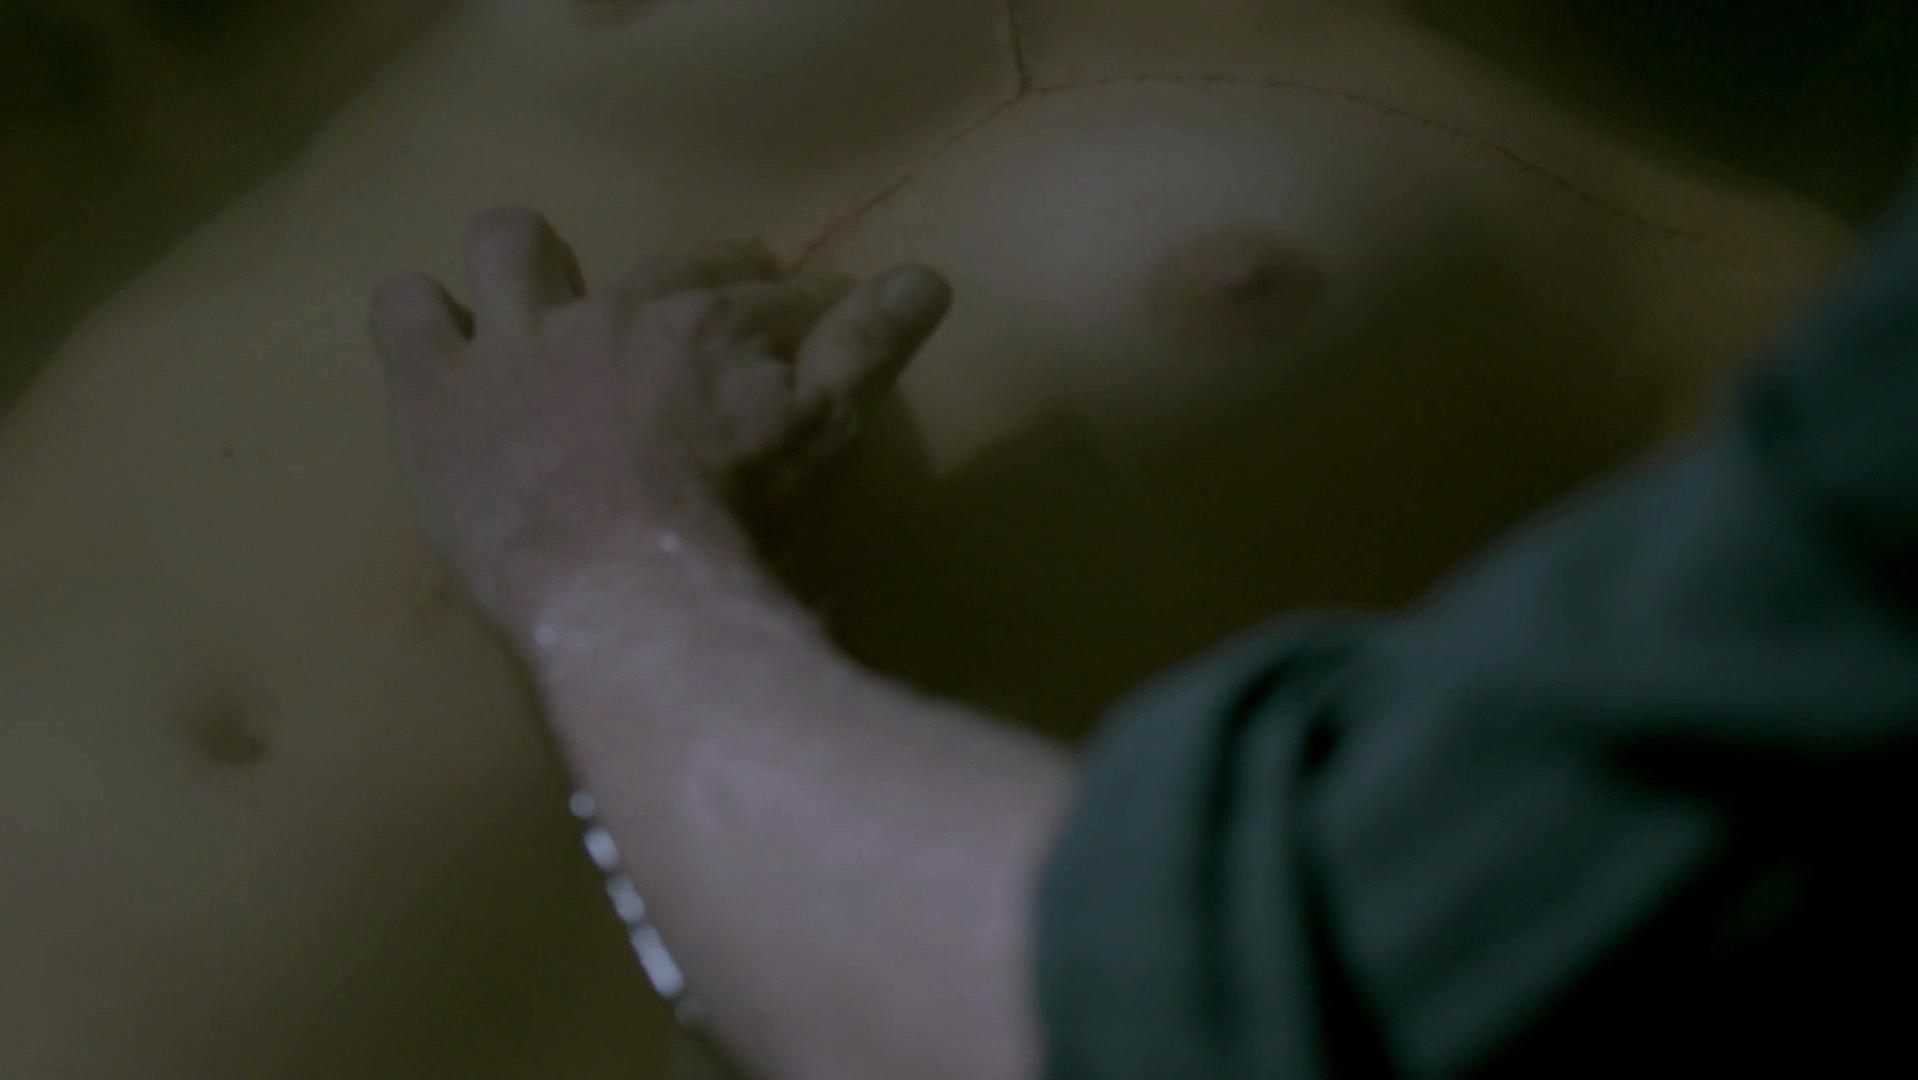 Billie Piper nude - Penny Dreadful s02e01 (2015)